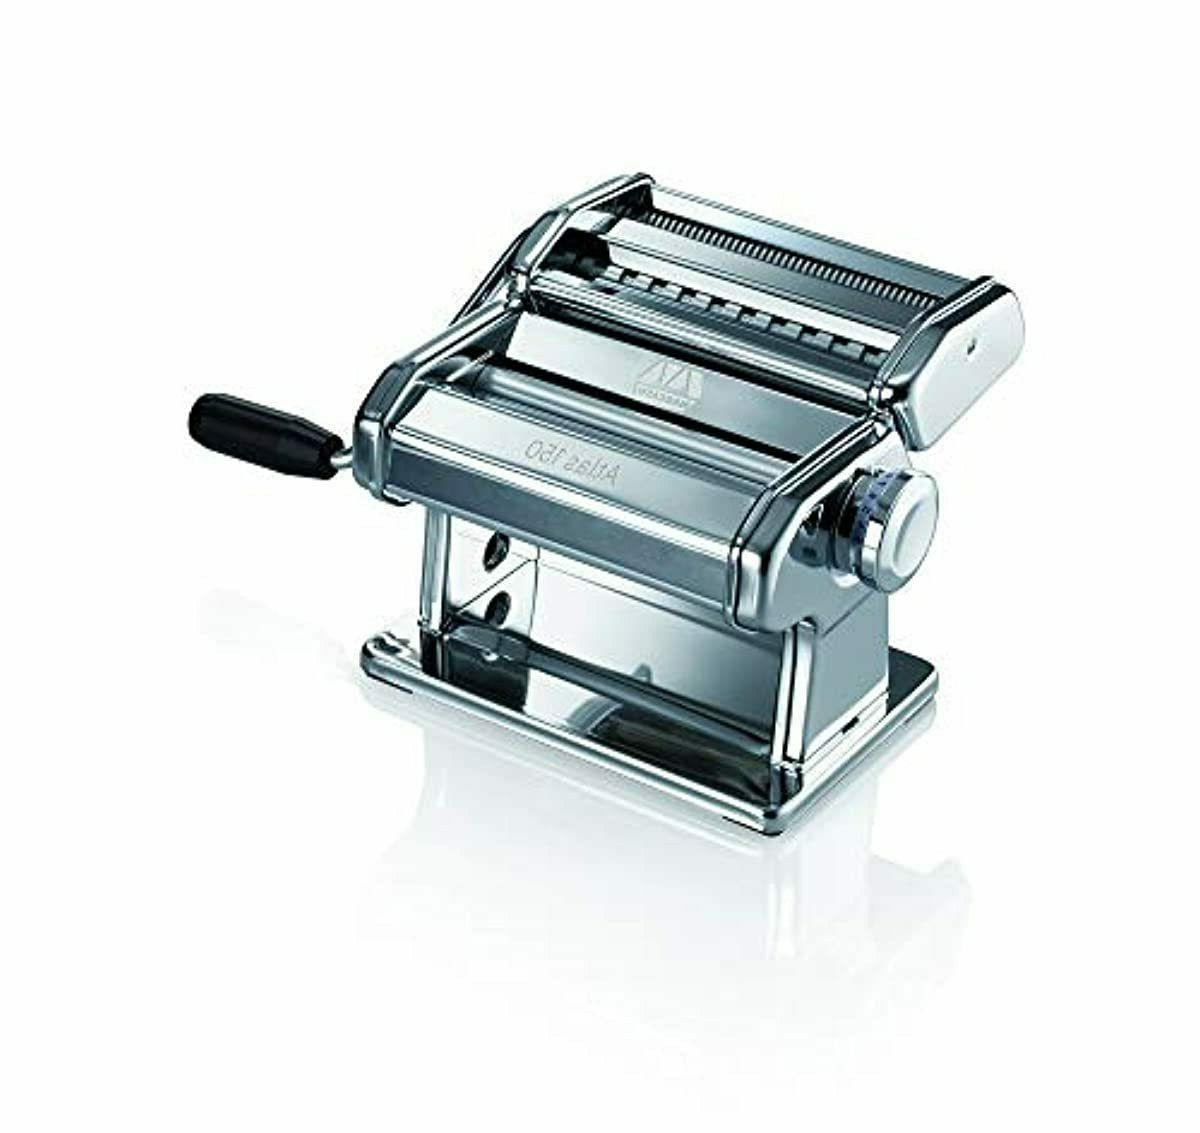 atlas 150 pasta machine made in italy